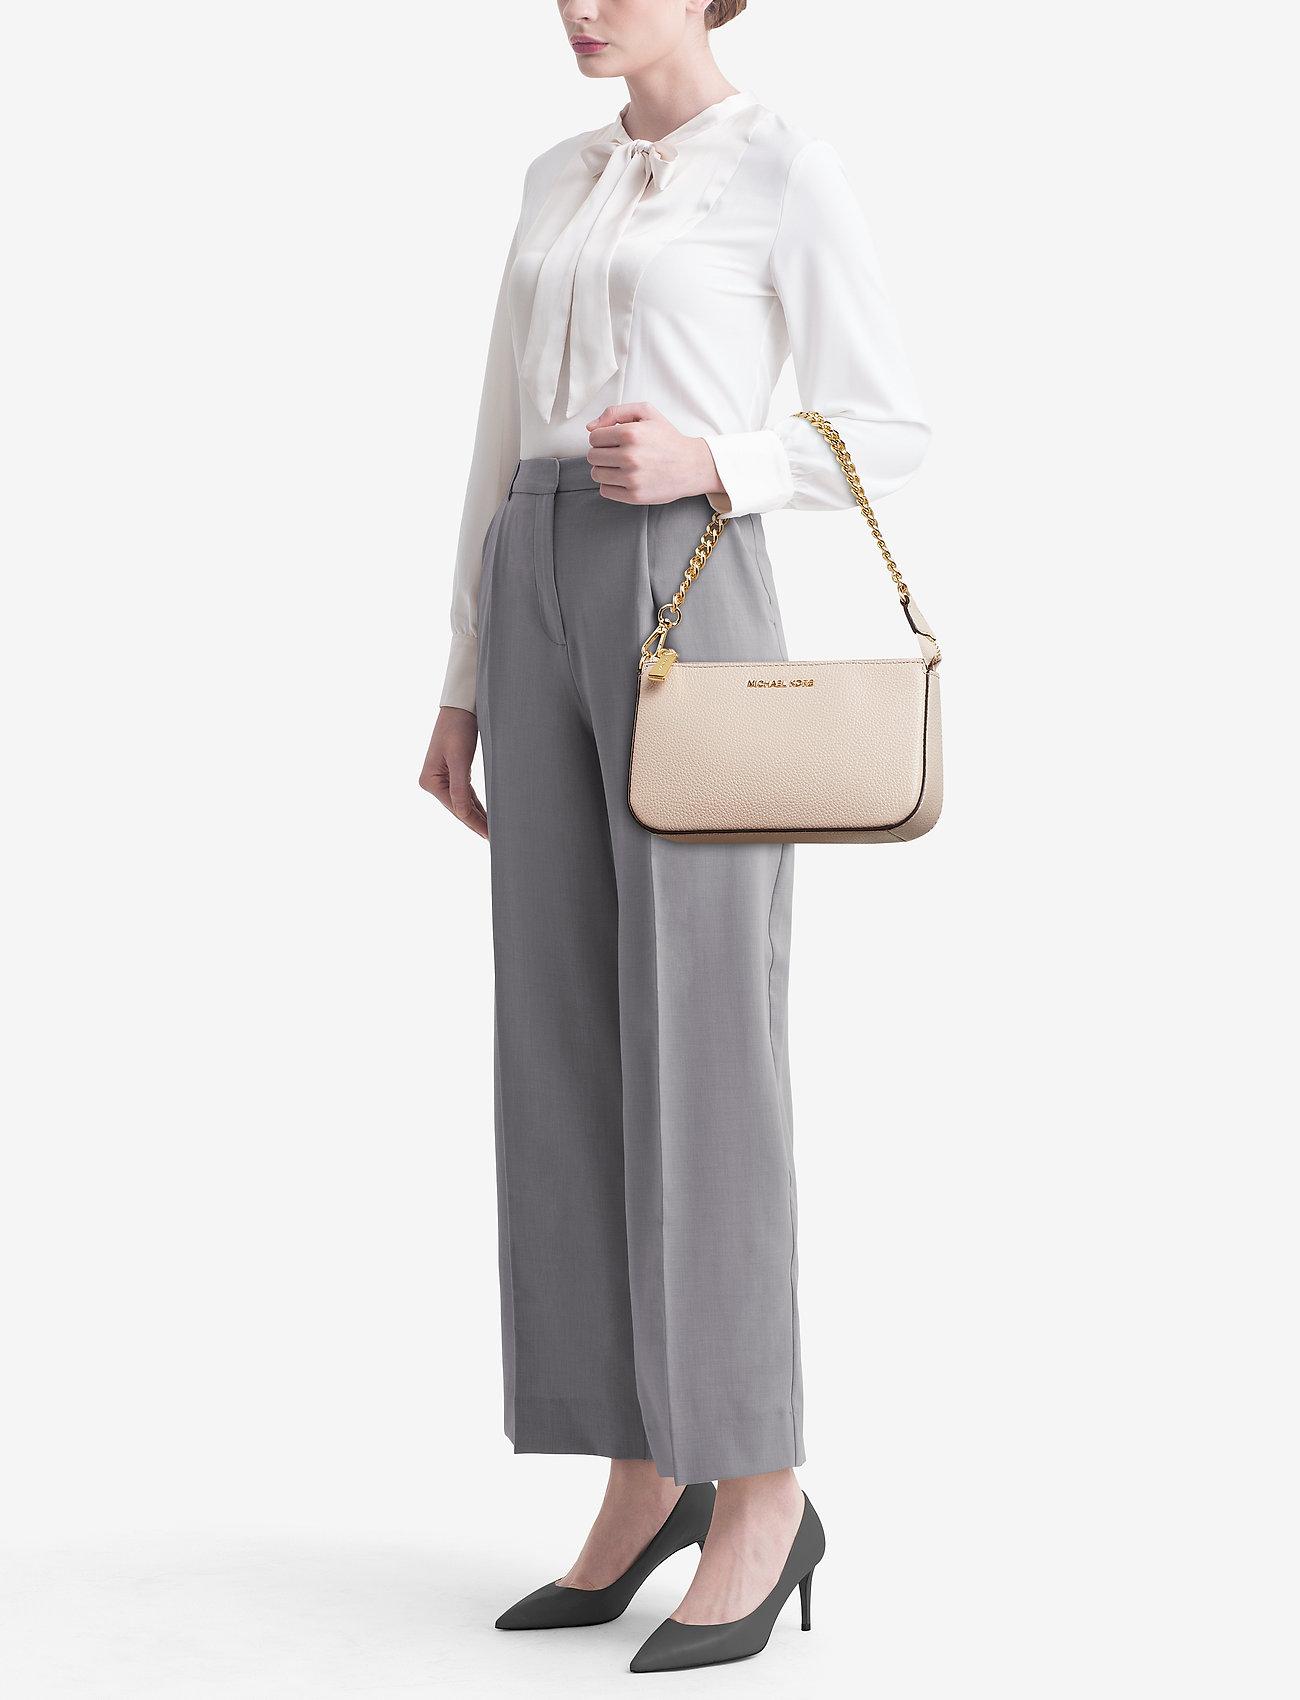 Md Pouchettesoft Clutches Bags Chain PinkMichael Kors Pouchesamp; 8mOyvn0wN